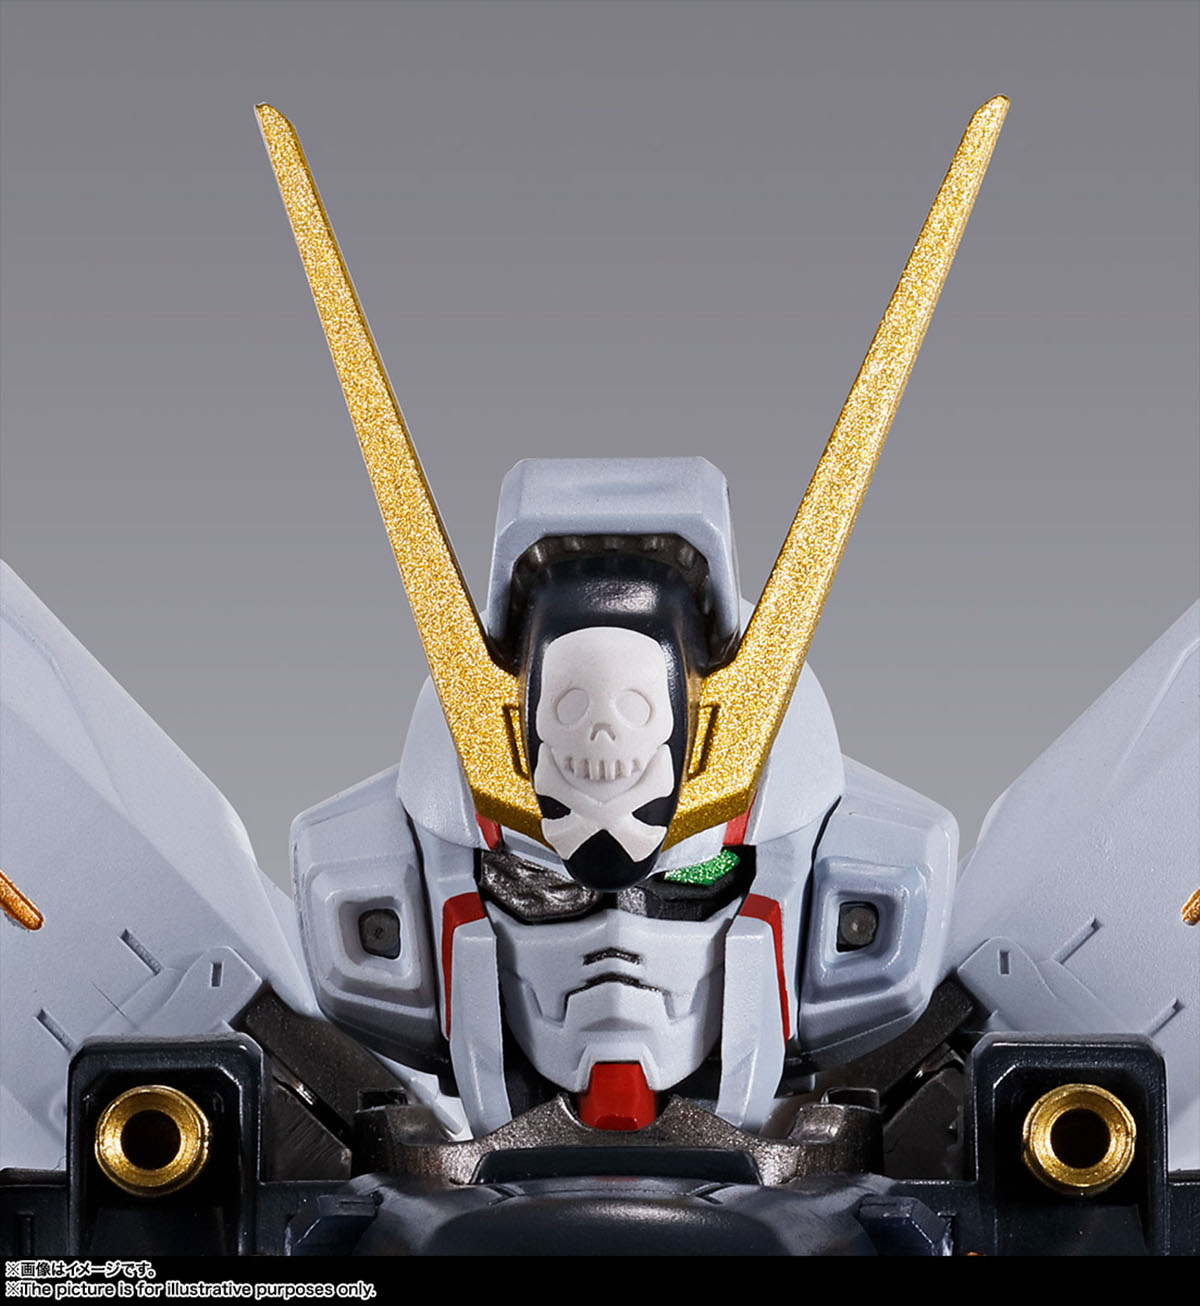 METAL BUILD『クロスボーン・ガンダムX1』機動戦士クロスボーン・ガンダム 可動フィギュア-013